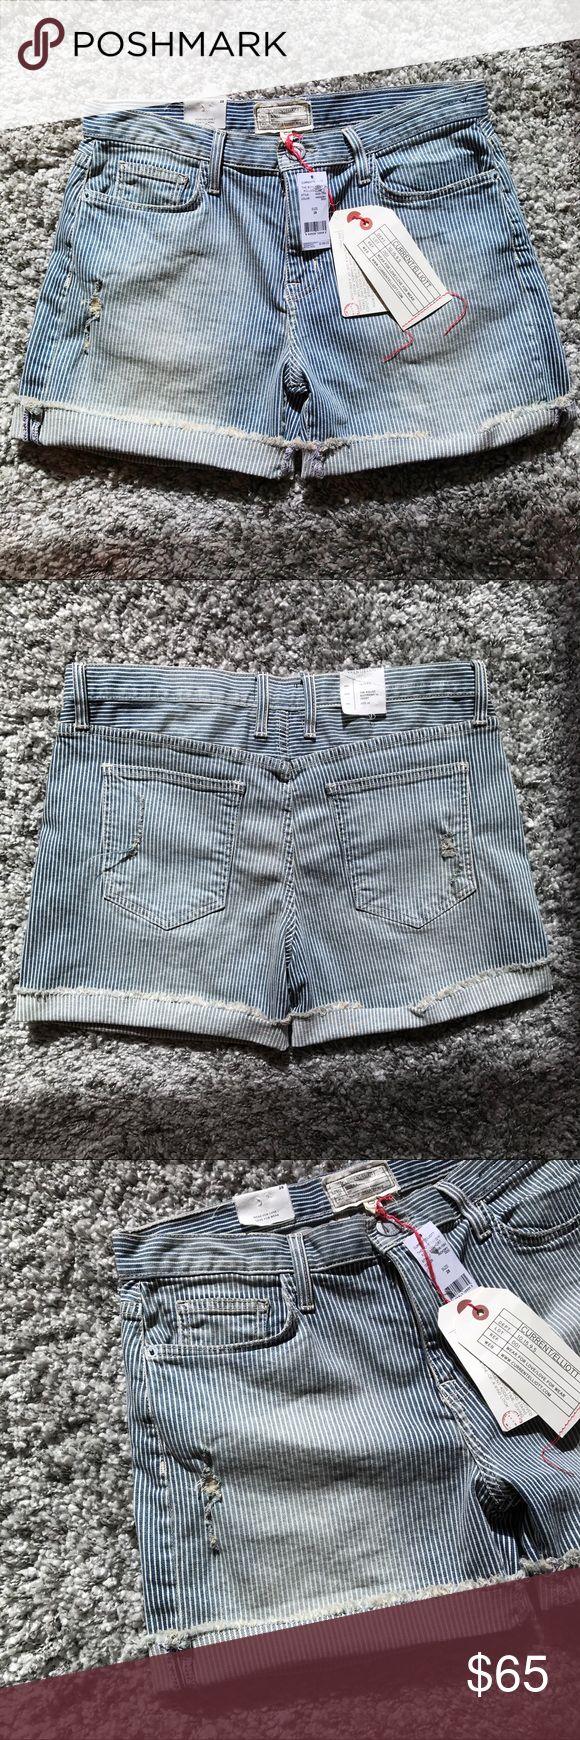 "NWT🔥Current/Elliott Boyfriend Rolled Shorts NWT🔥Current/Elliott Striped Boyfriend Rolled Shorts. Size: 28"" Length: 13.5""-14.""  Retail Price: $188  #currentelliott #28 #shorts #boyfriend #striped #stripe #rolled #rollup #jeans #wornout #ribbed #nwt #denim #denimshorts Current/Elliott Shorts Jean Shorts"